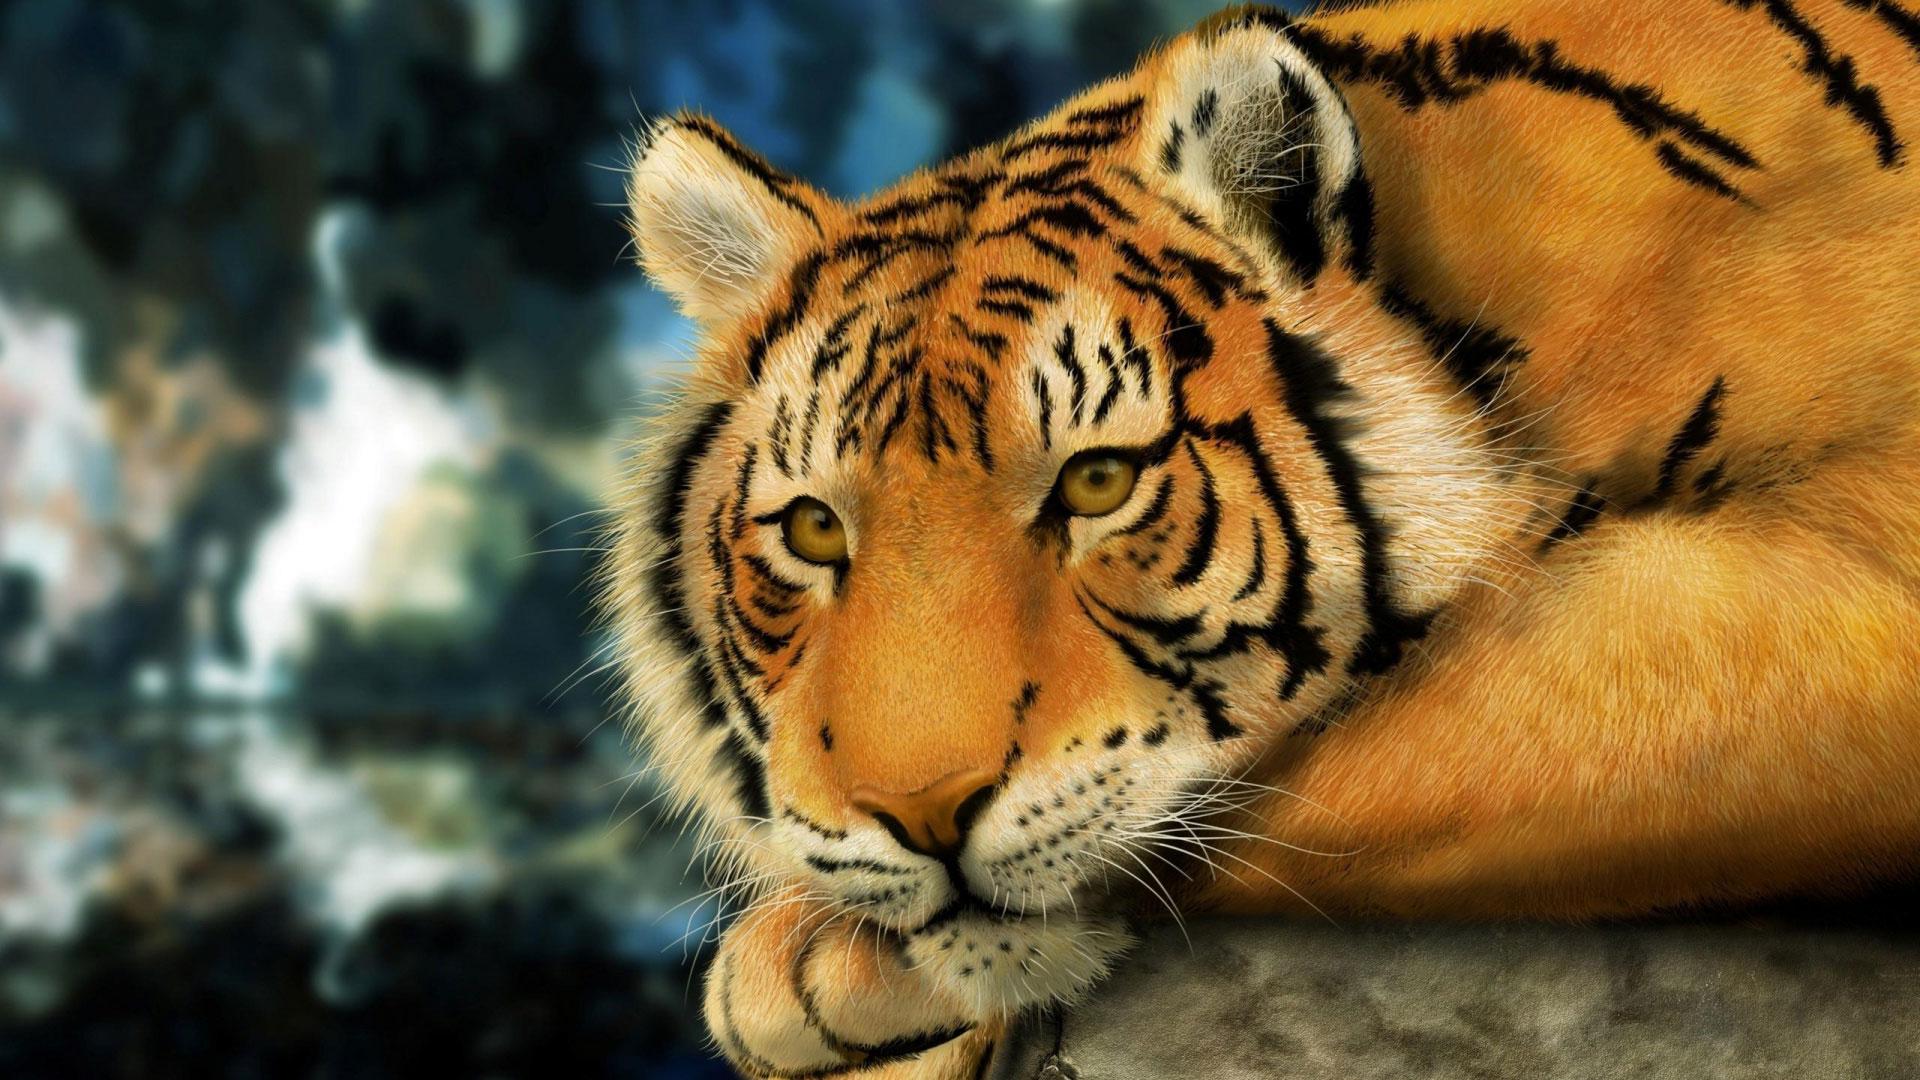 Обои Уссурийский тигр , картинки - Обои ...: etsphoto.ru/tigr-amurskiyy-foto-oboi.html